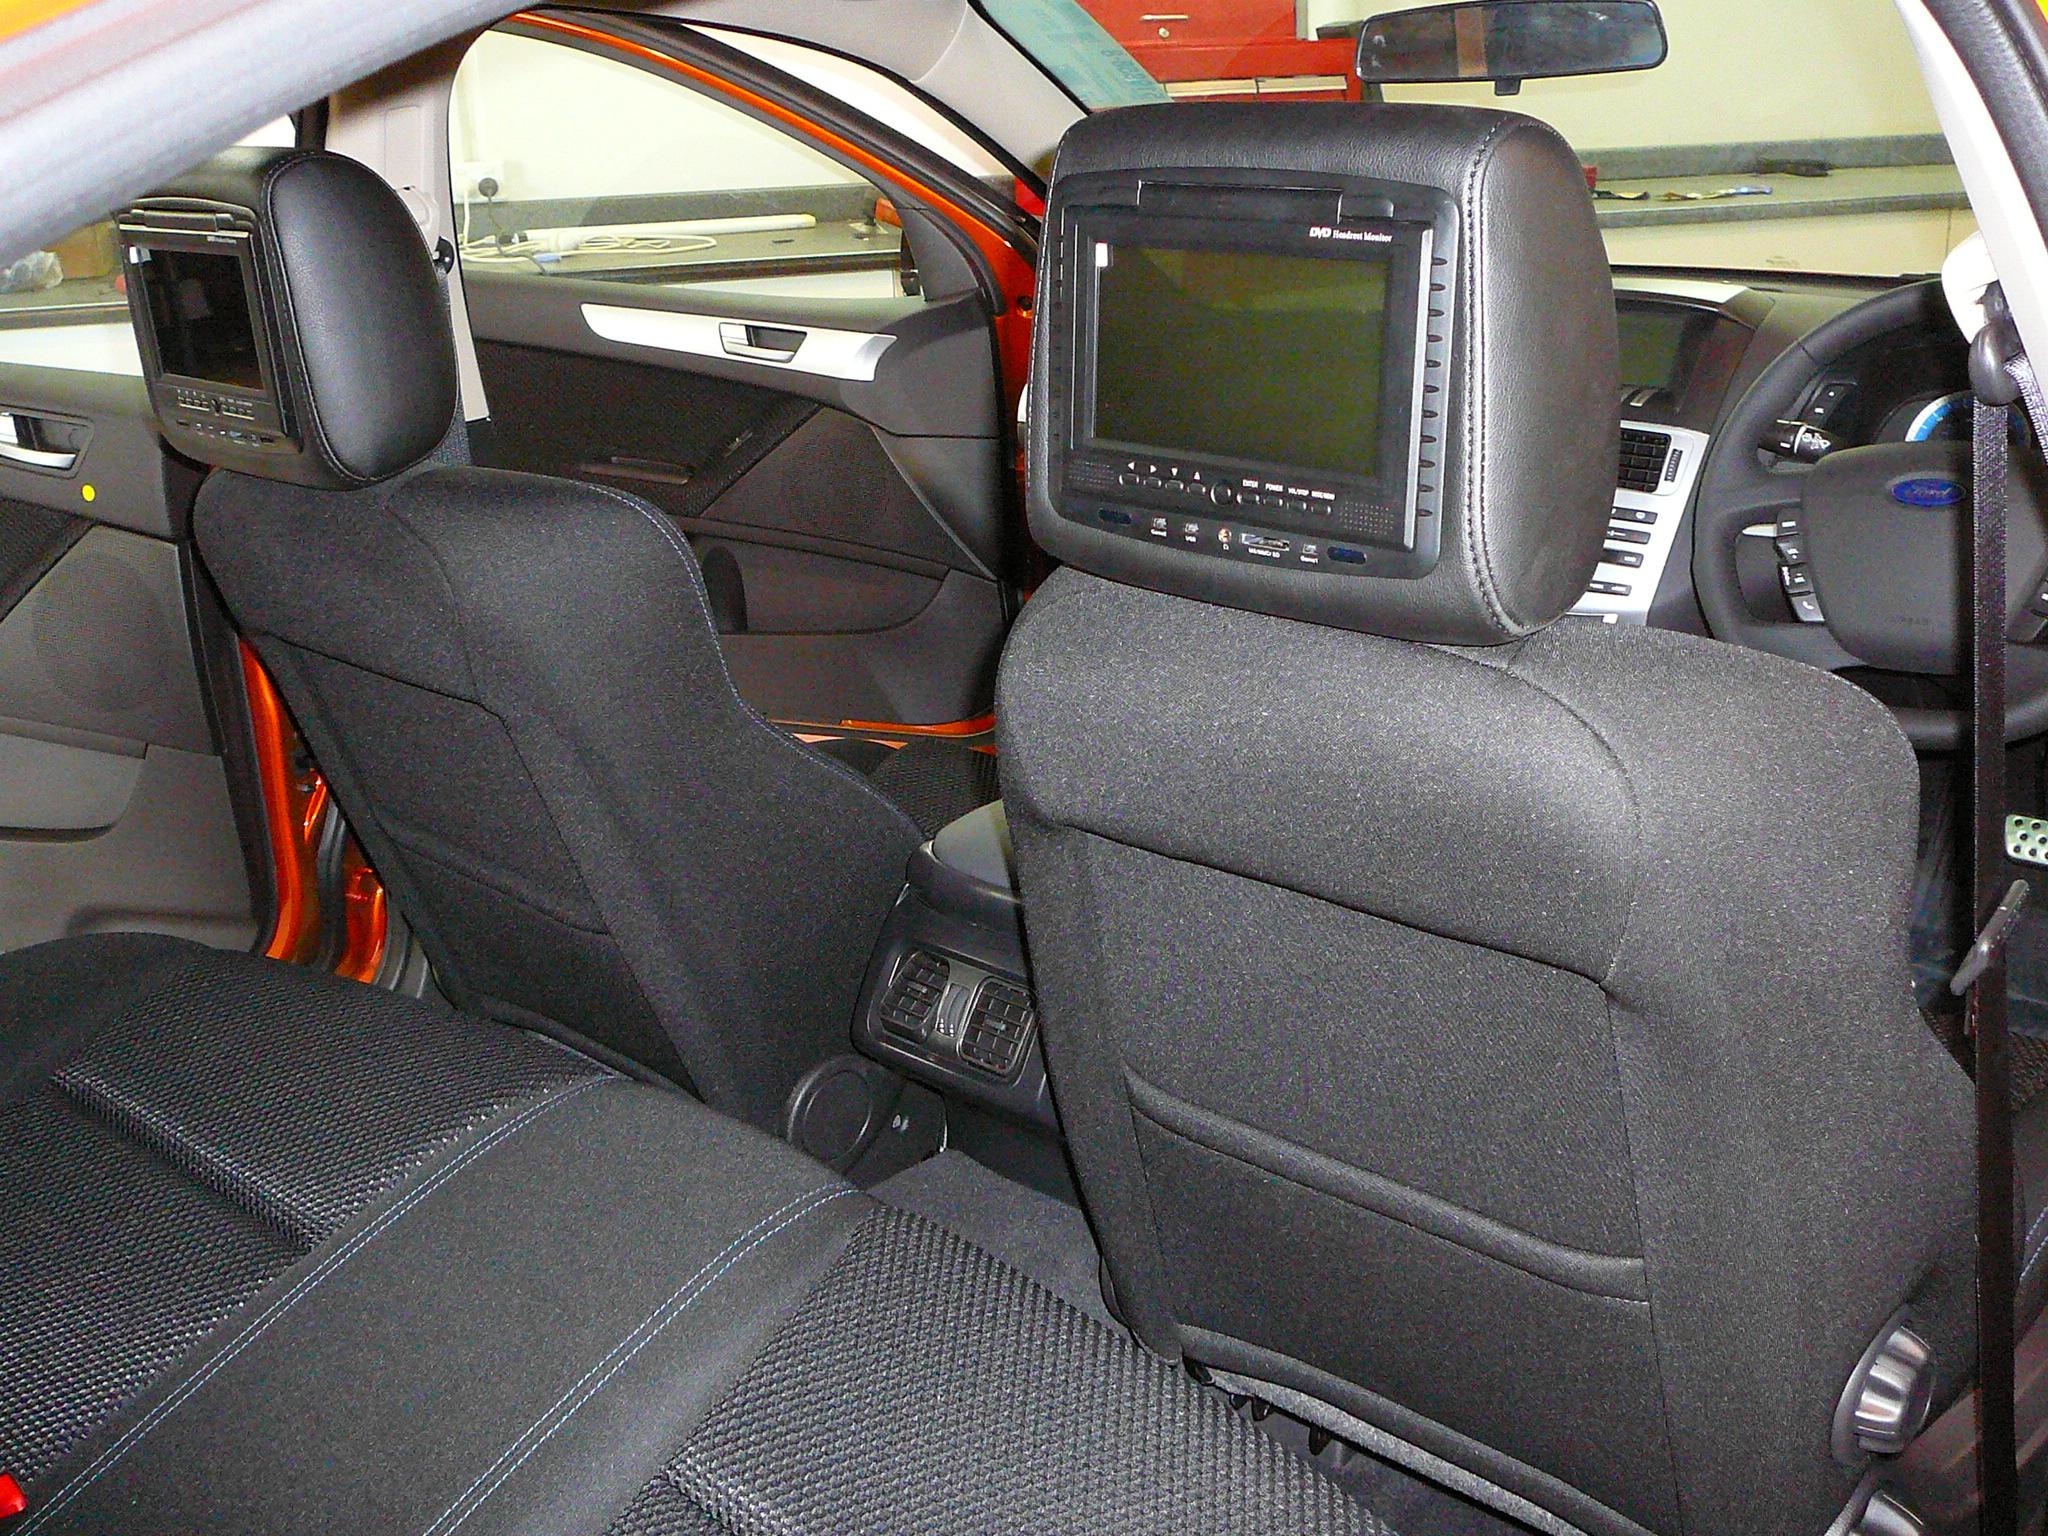 2009 Ford Xr6 Head Unit :: Dragonsfootball17